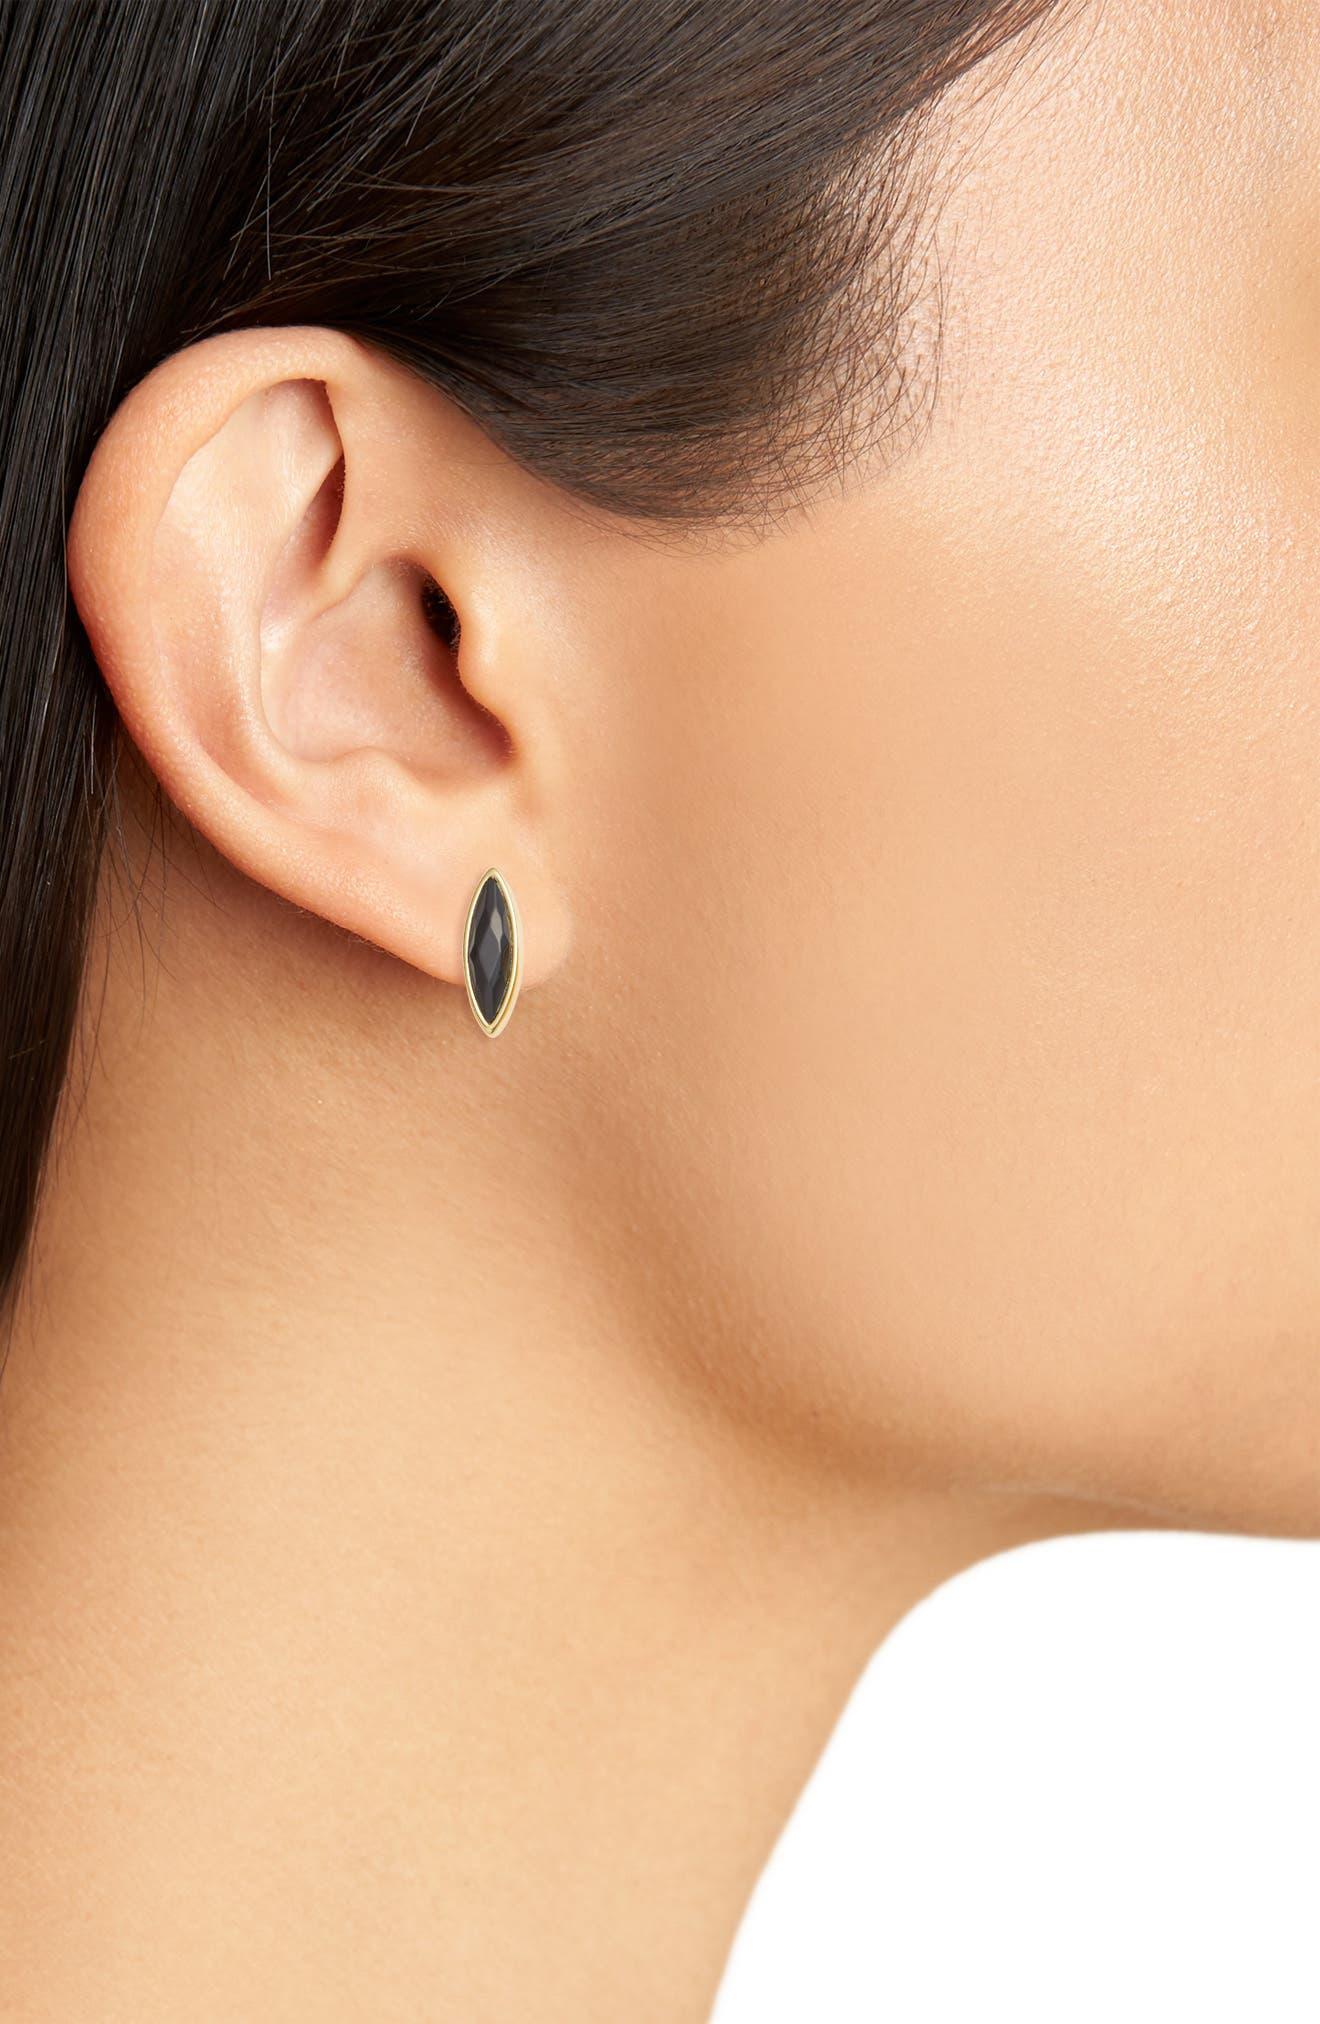 Palisades Stud Earrings,                             Alternate thumbnail 2, color,                             BLACK DYED JADE/ GOLD